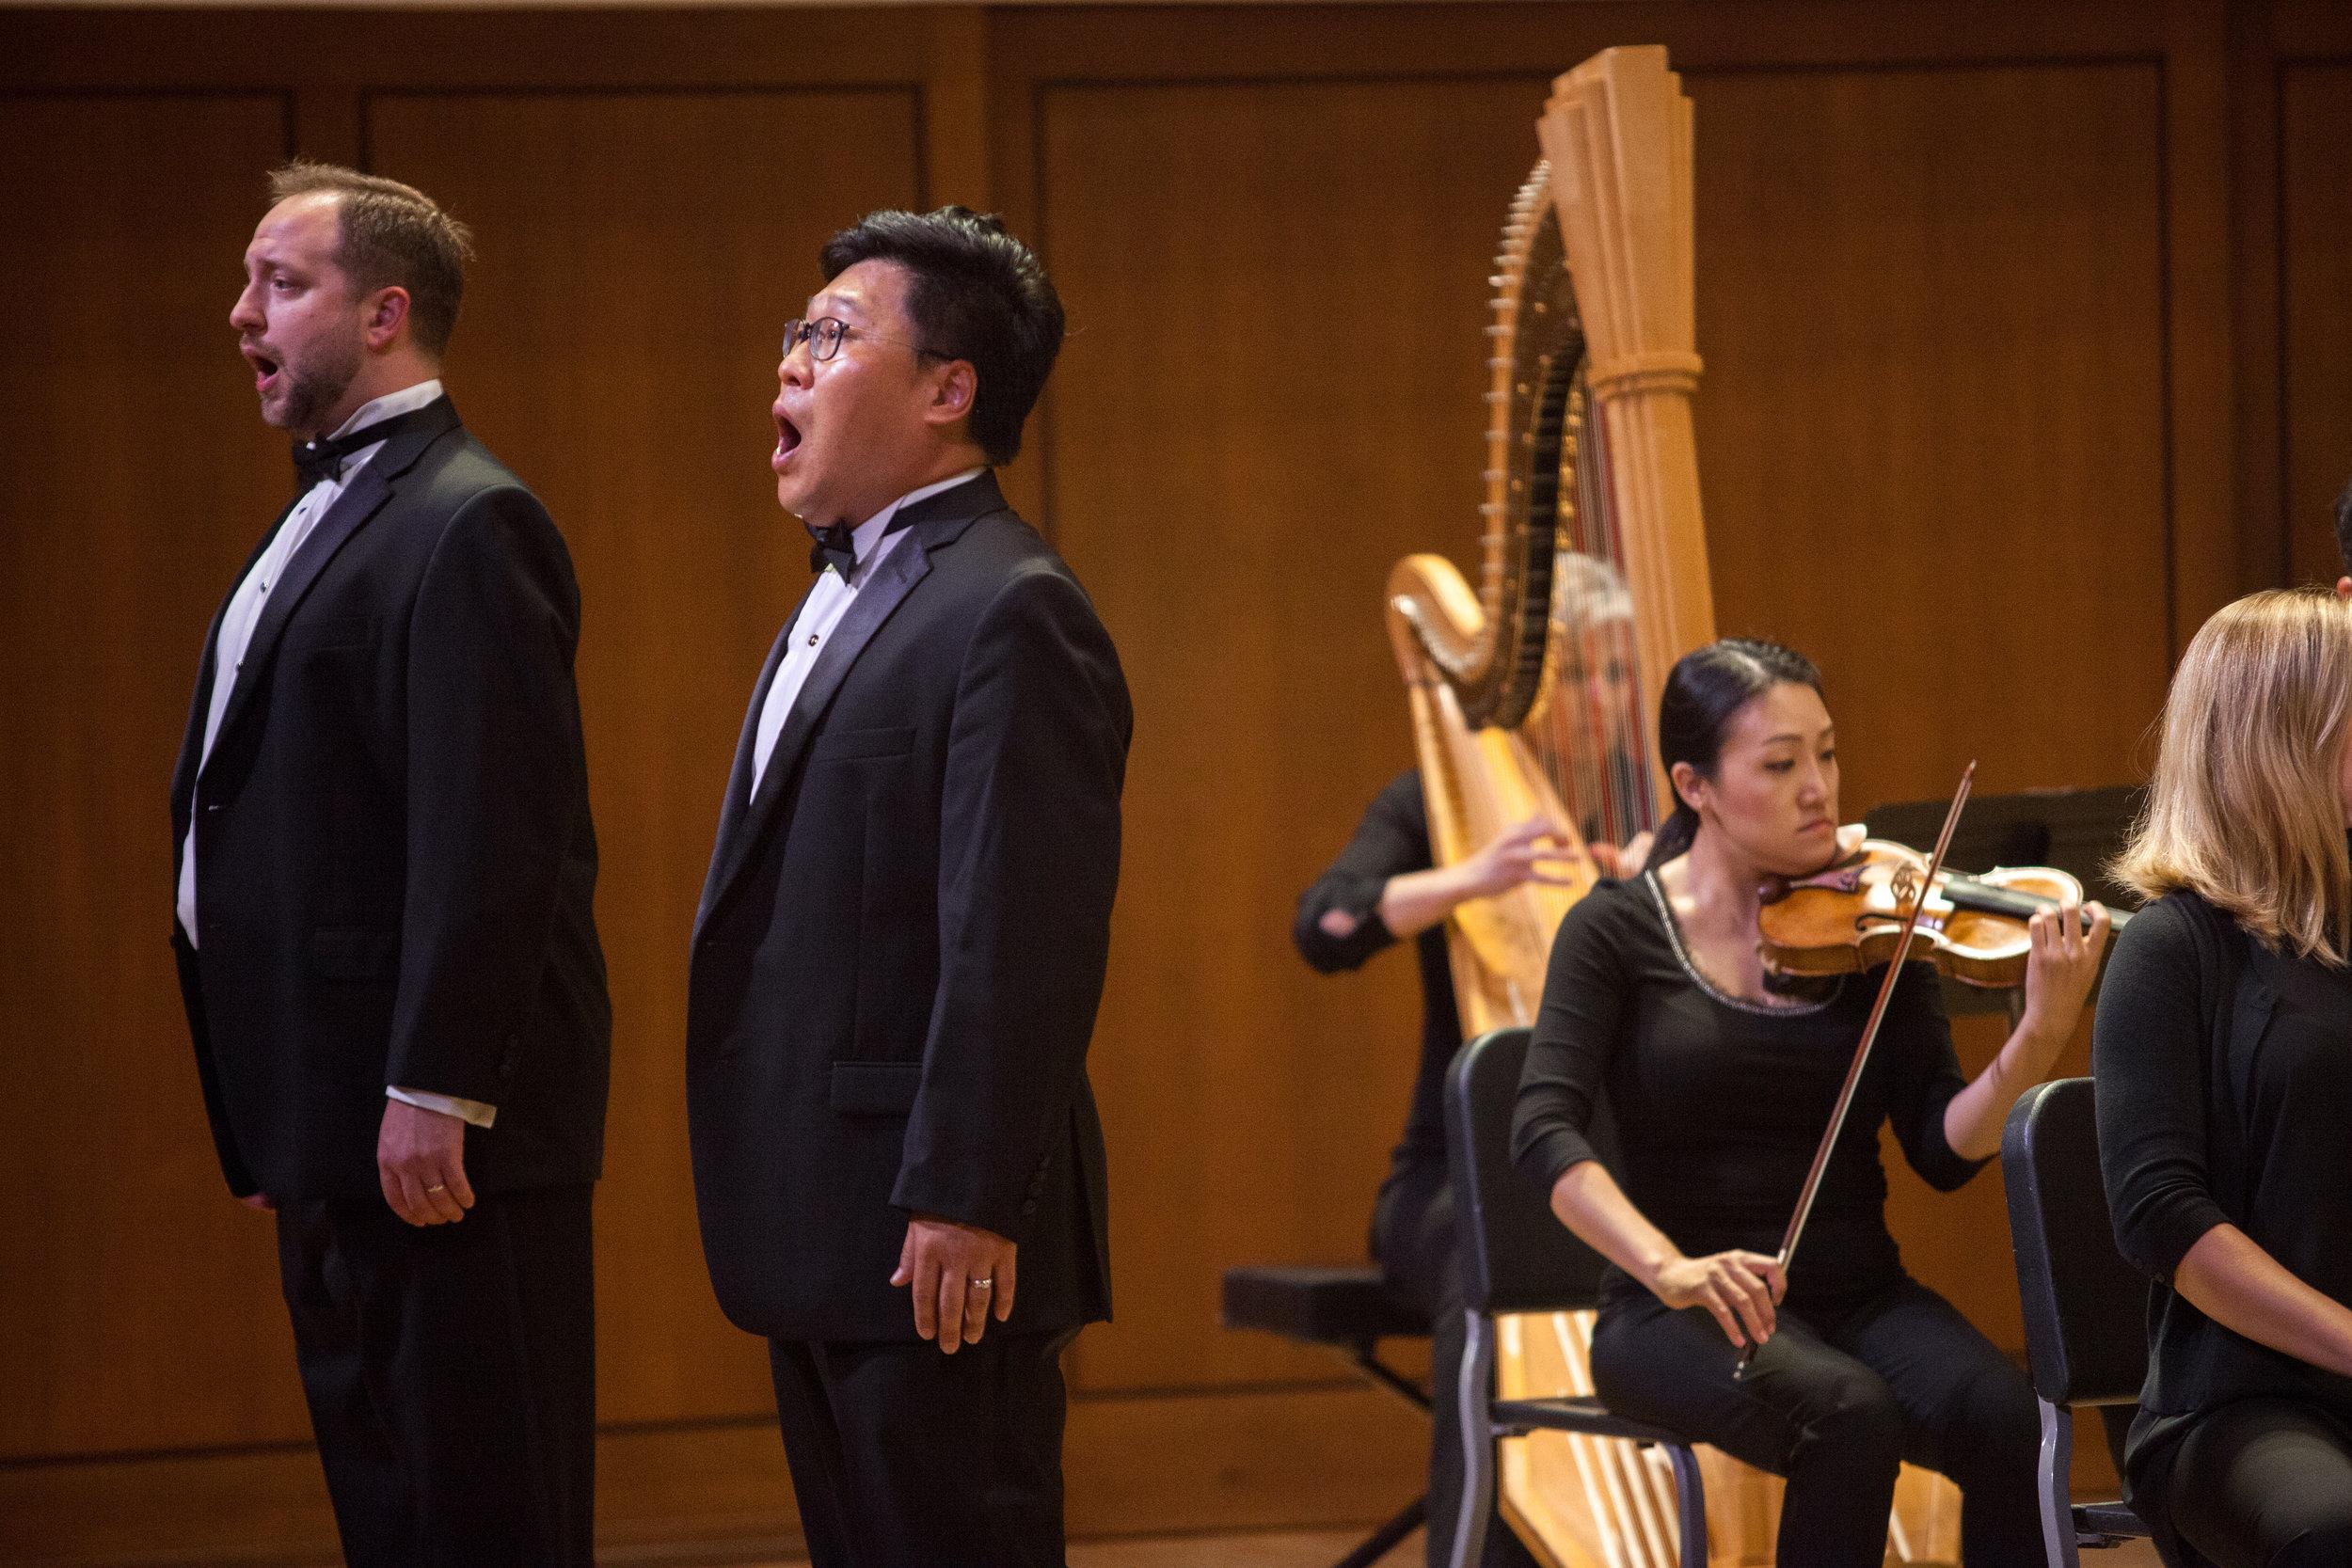 Soonchan Kwon, tenor, and Benjamin Cox, performing a duet.